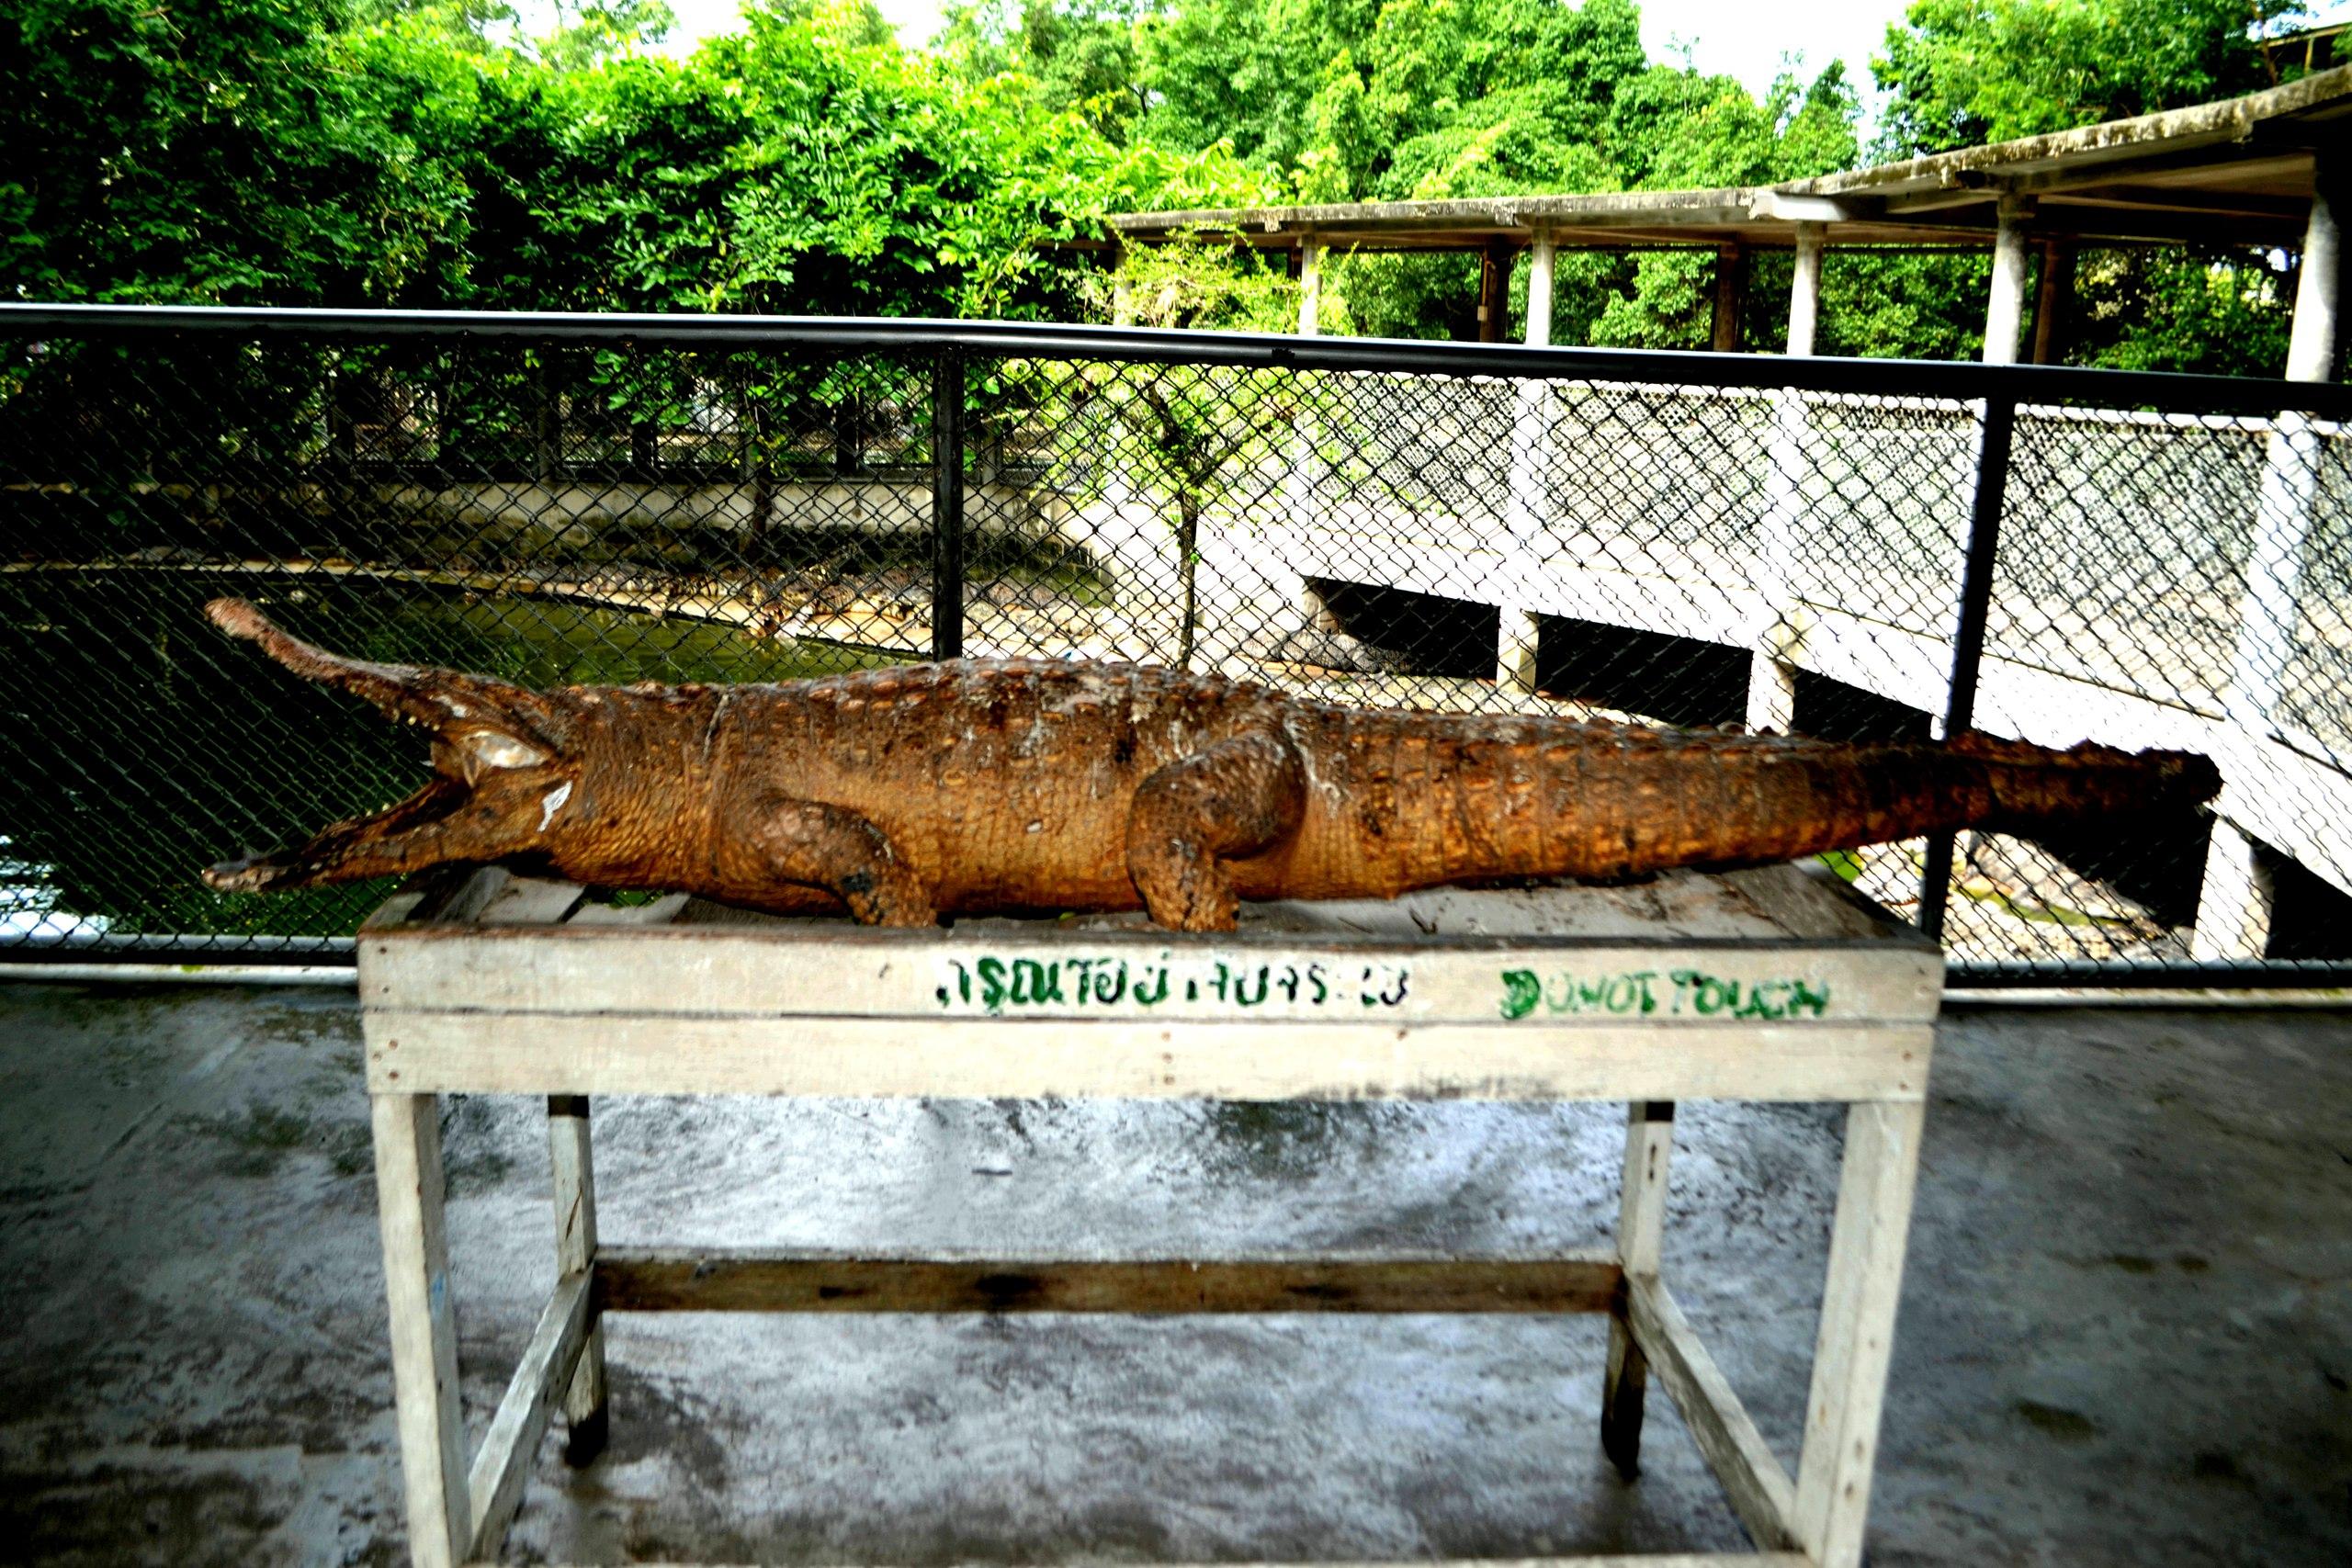 Елена Руденко ( Валтея ). Таиланд. Парк миллионолетних камней и крокодиловая ферма. N4PCOHK44cw